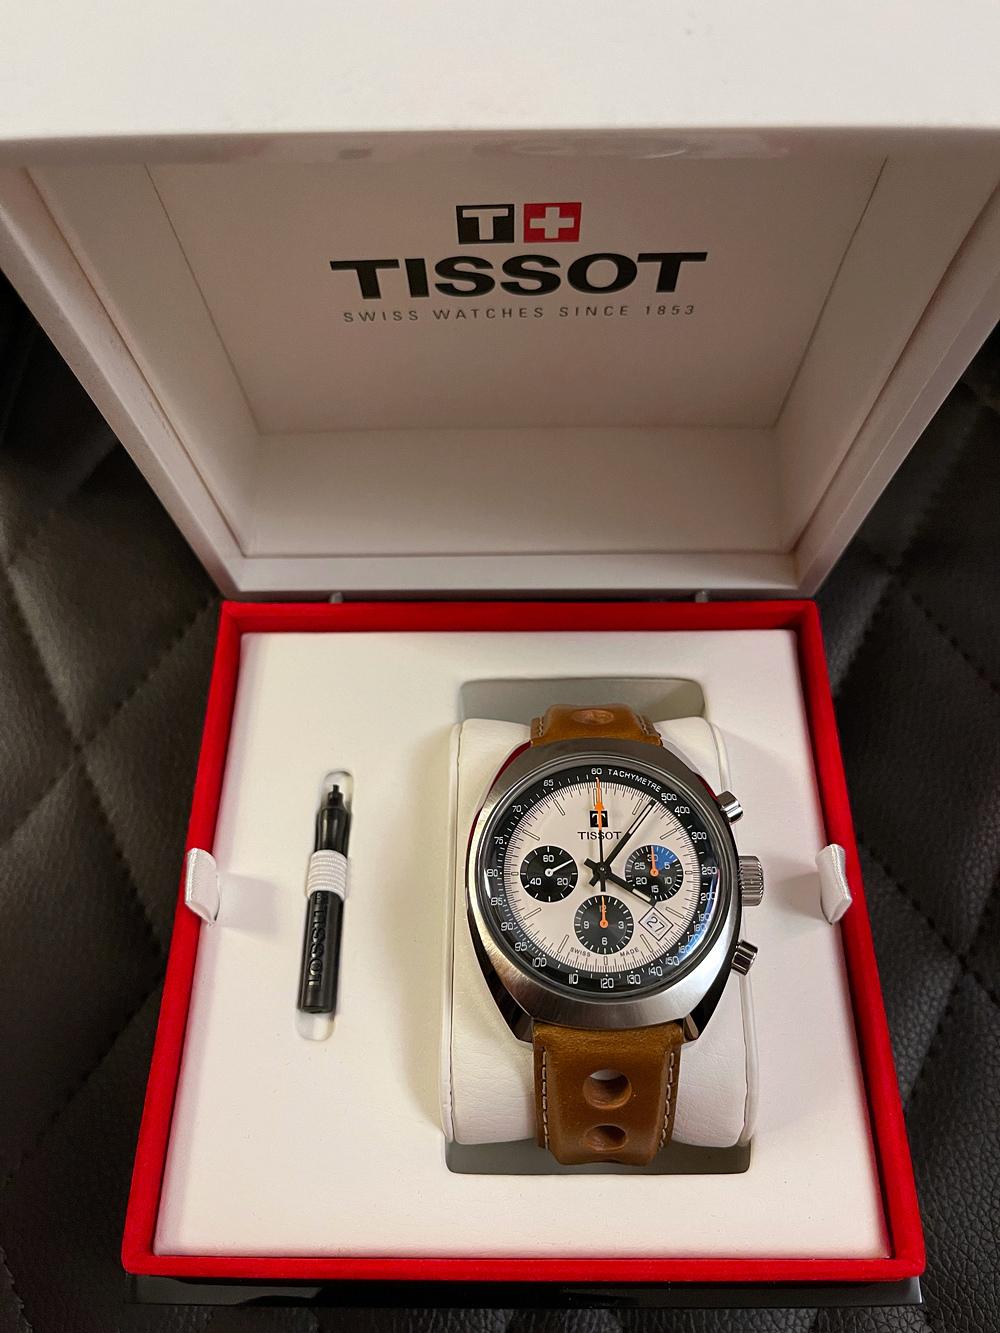 [Vendo] Tissot Heritage 1973 - Chrono Automático Img_4315